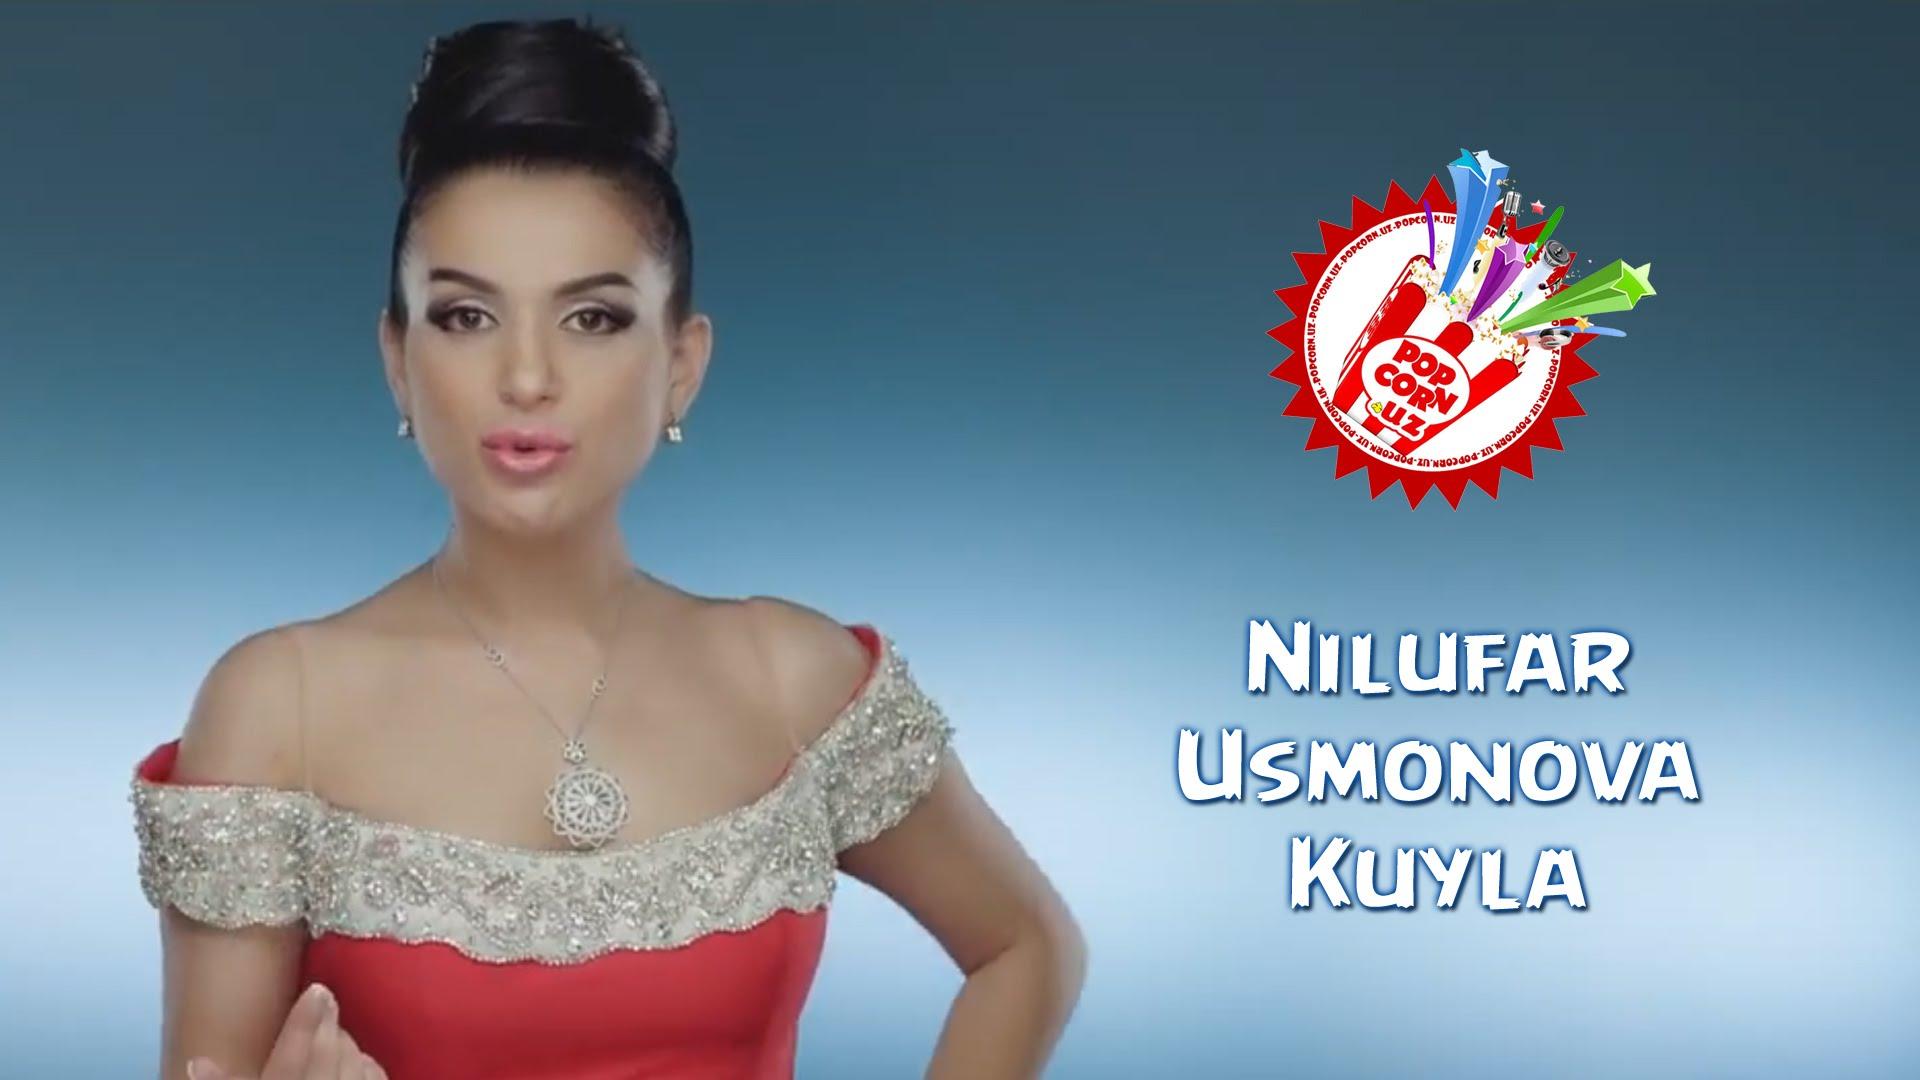 Nilufar Usmonova - Kuyla (Official music video)